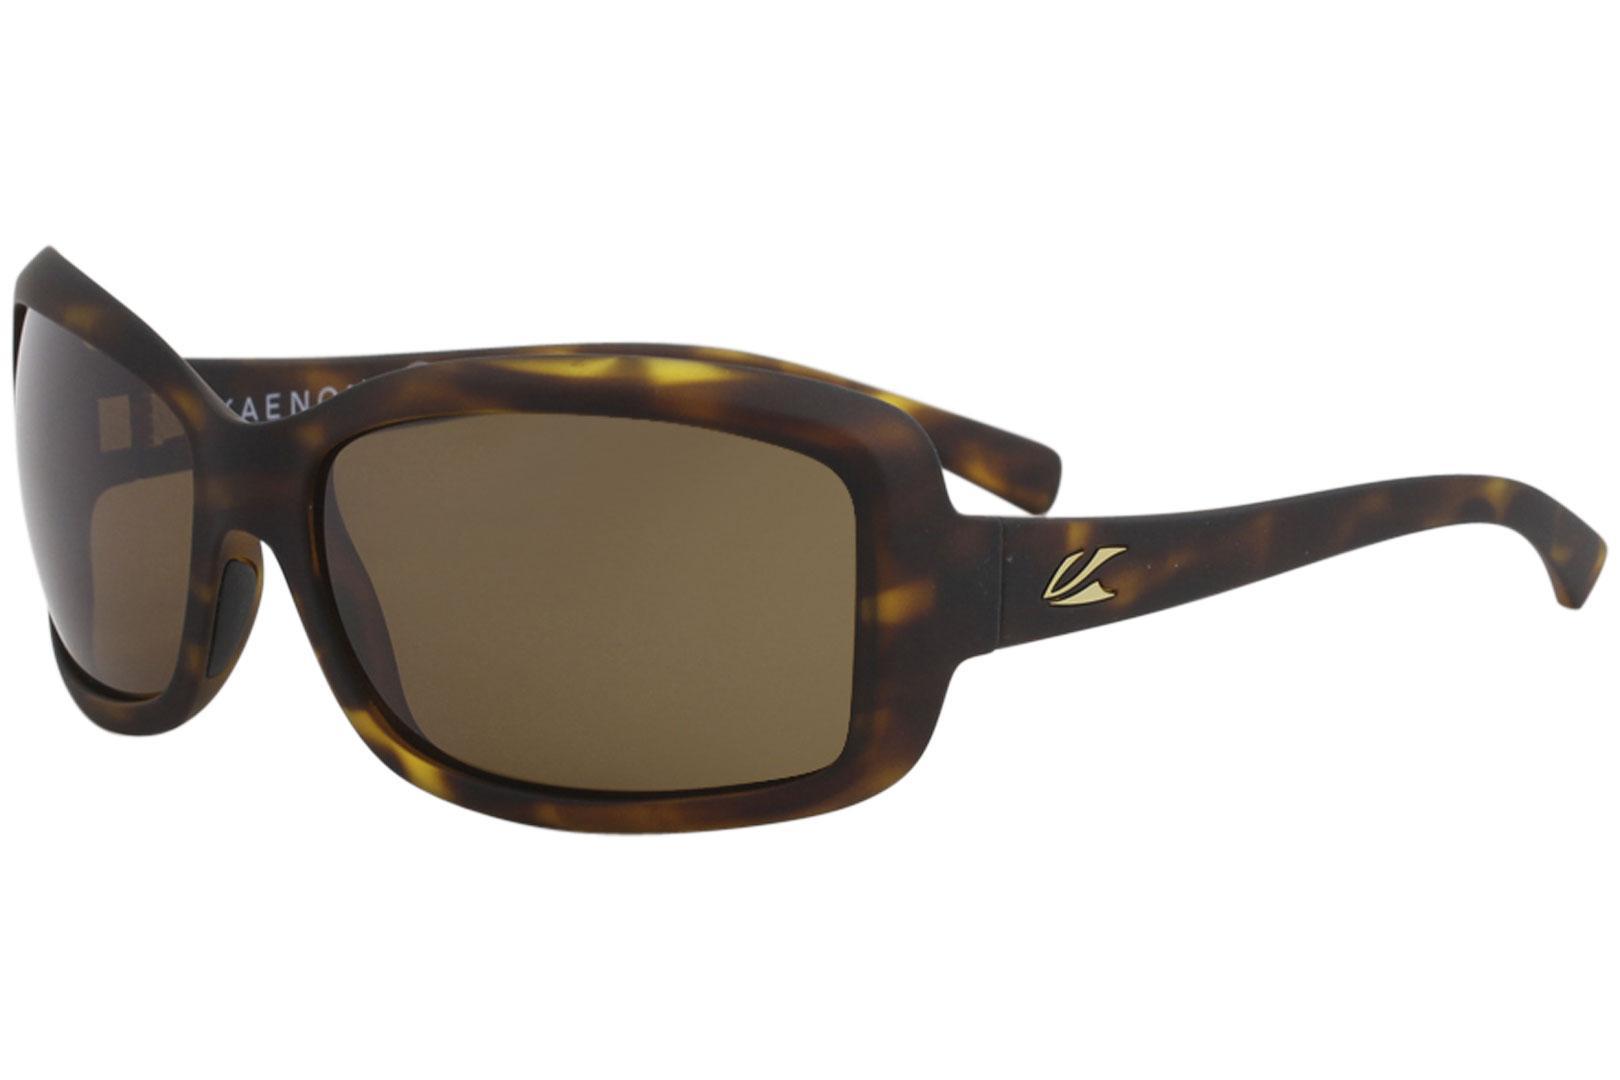 22cfb7e2715 Kaenon Women s Lunada B12 Matte Tort Gold Ultra Brown Polarized ...